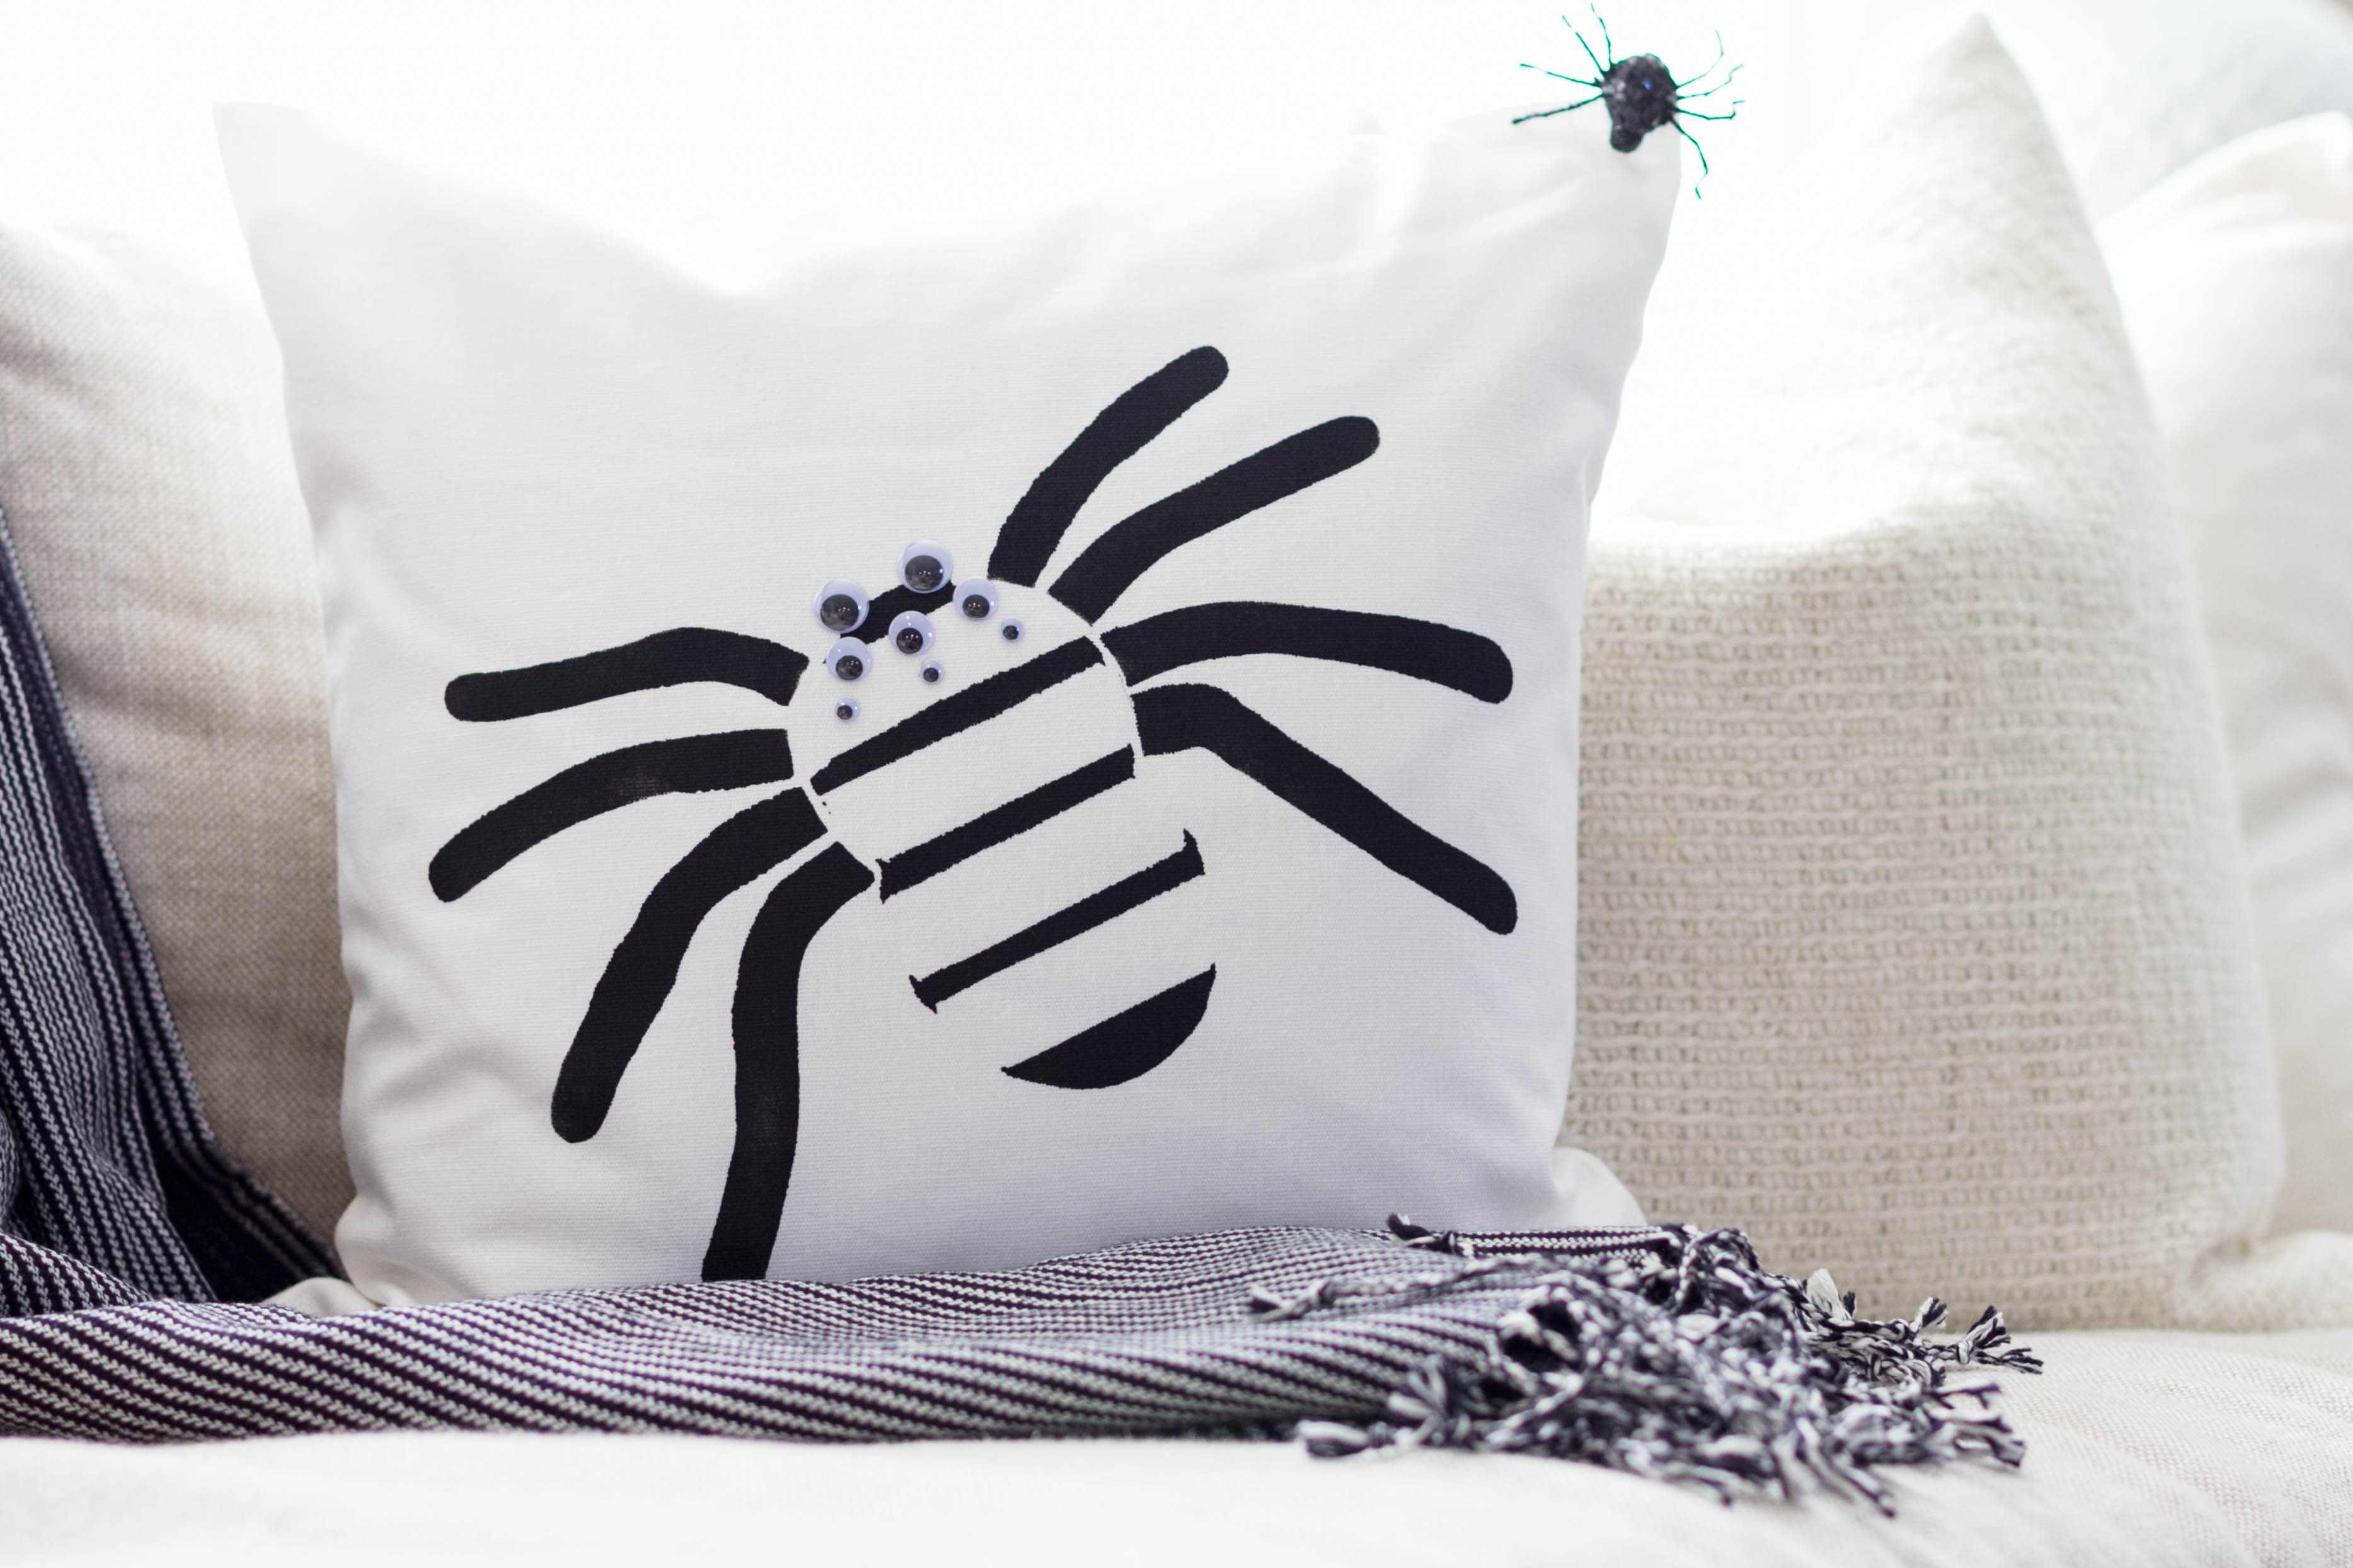 Cutting Edge Stencils Paint Pillow (Create & Share)